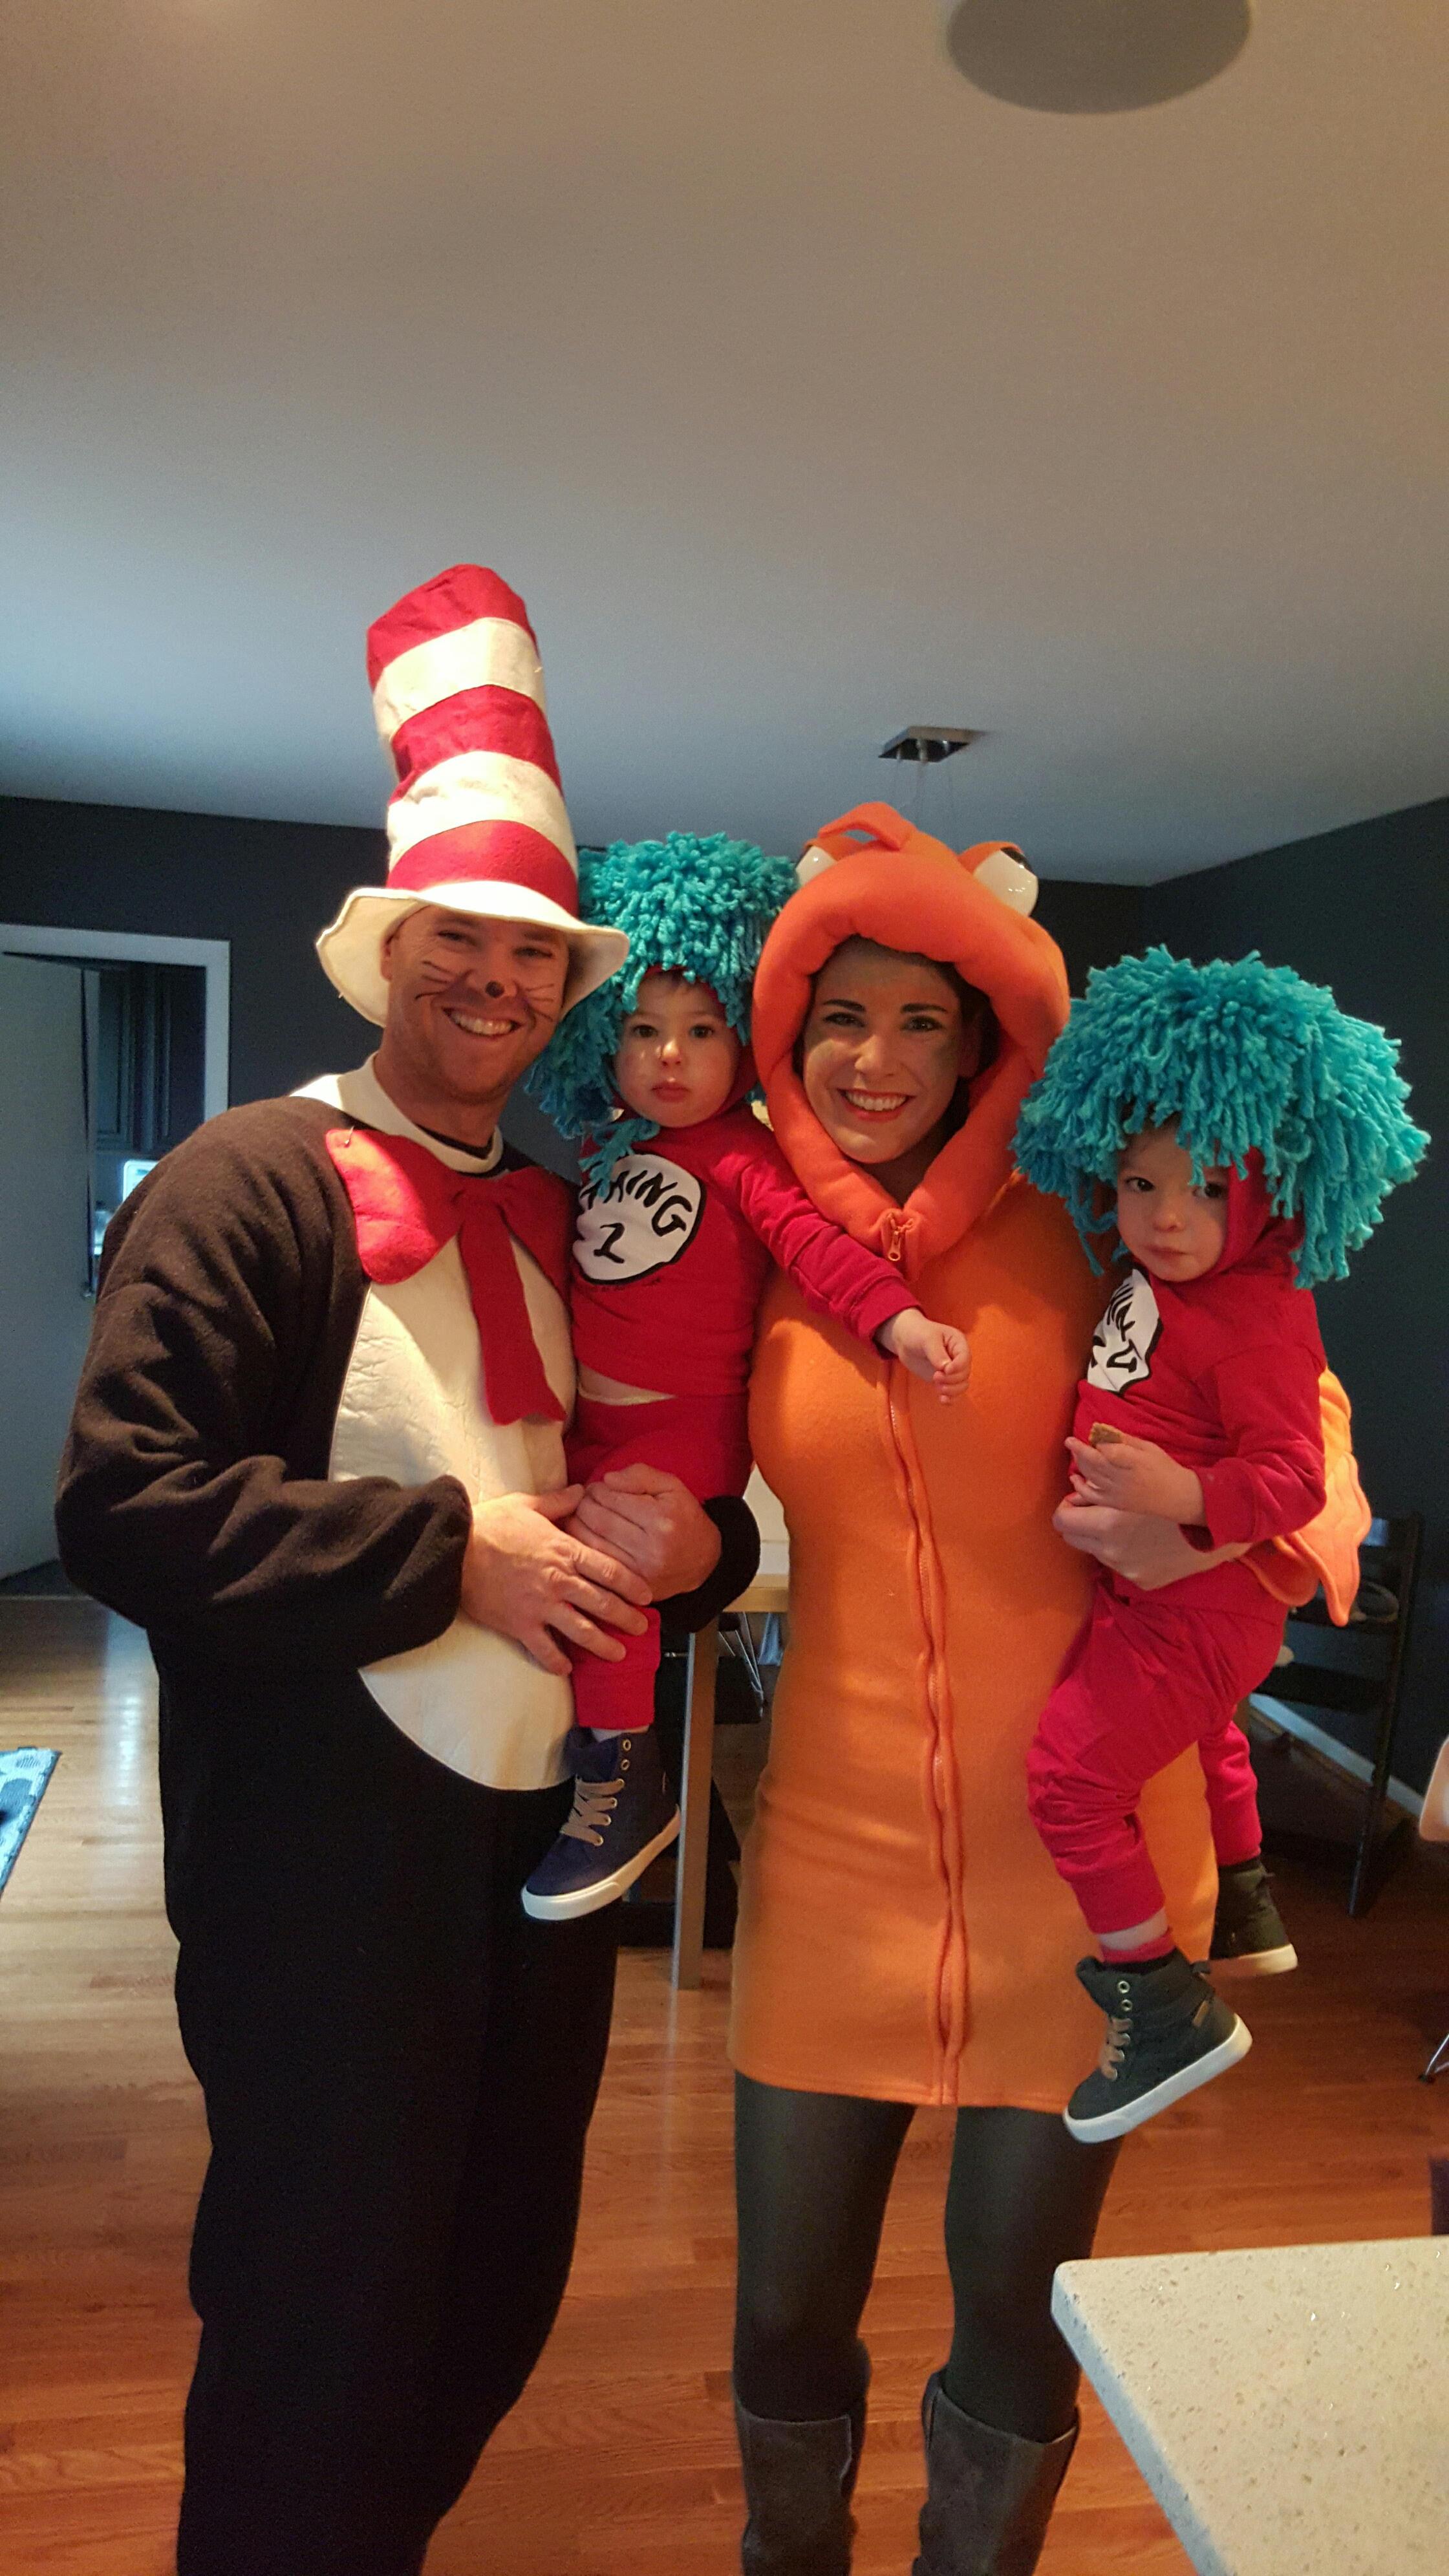 Montco's Halloween Costume Contest Presented by Jamba ...